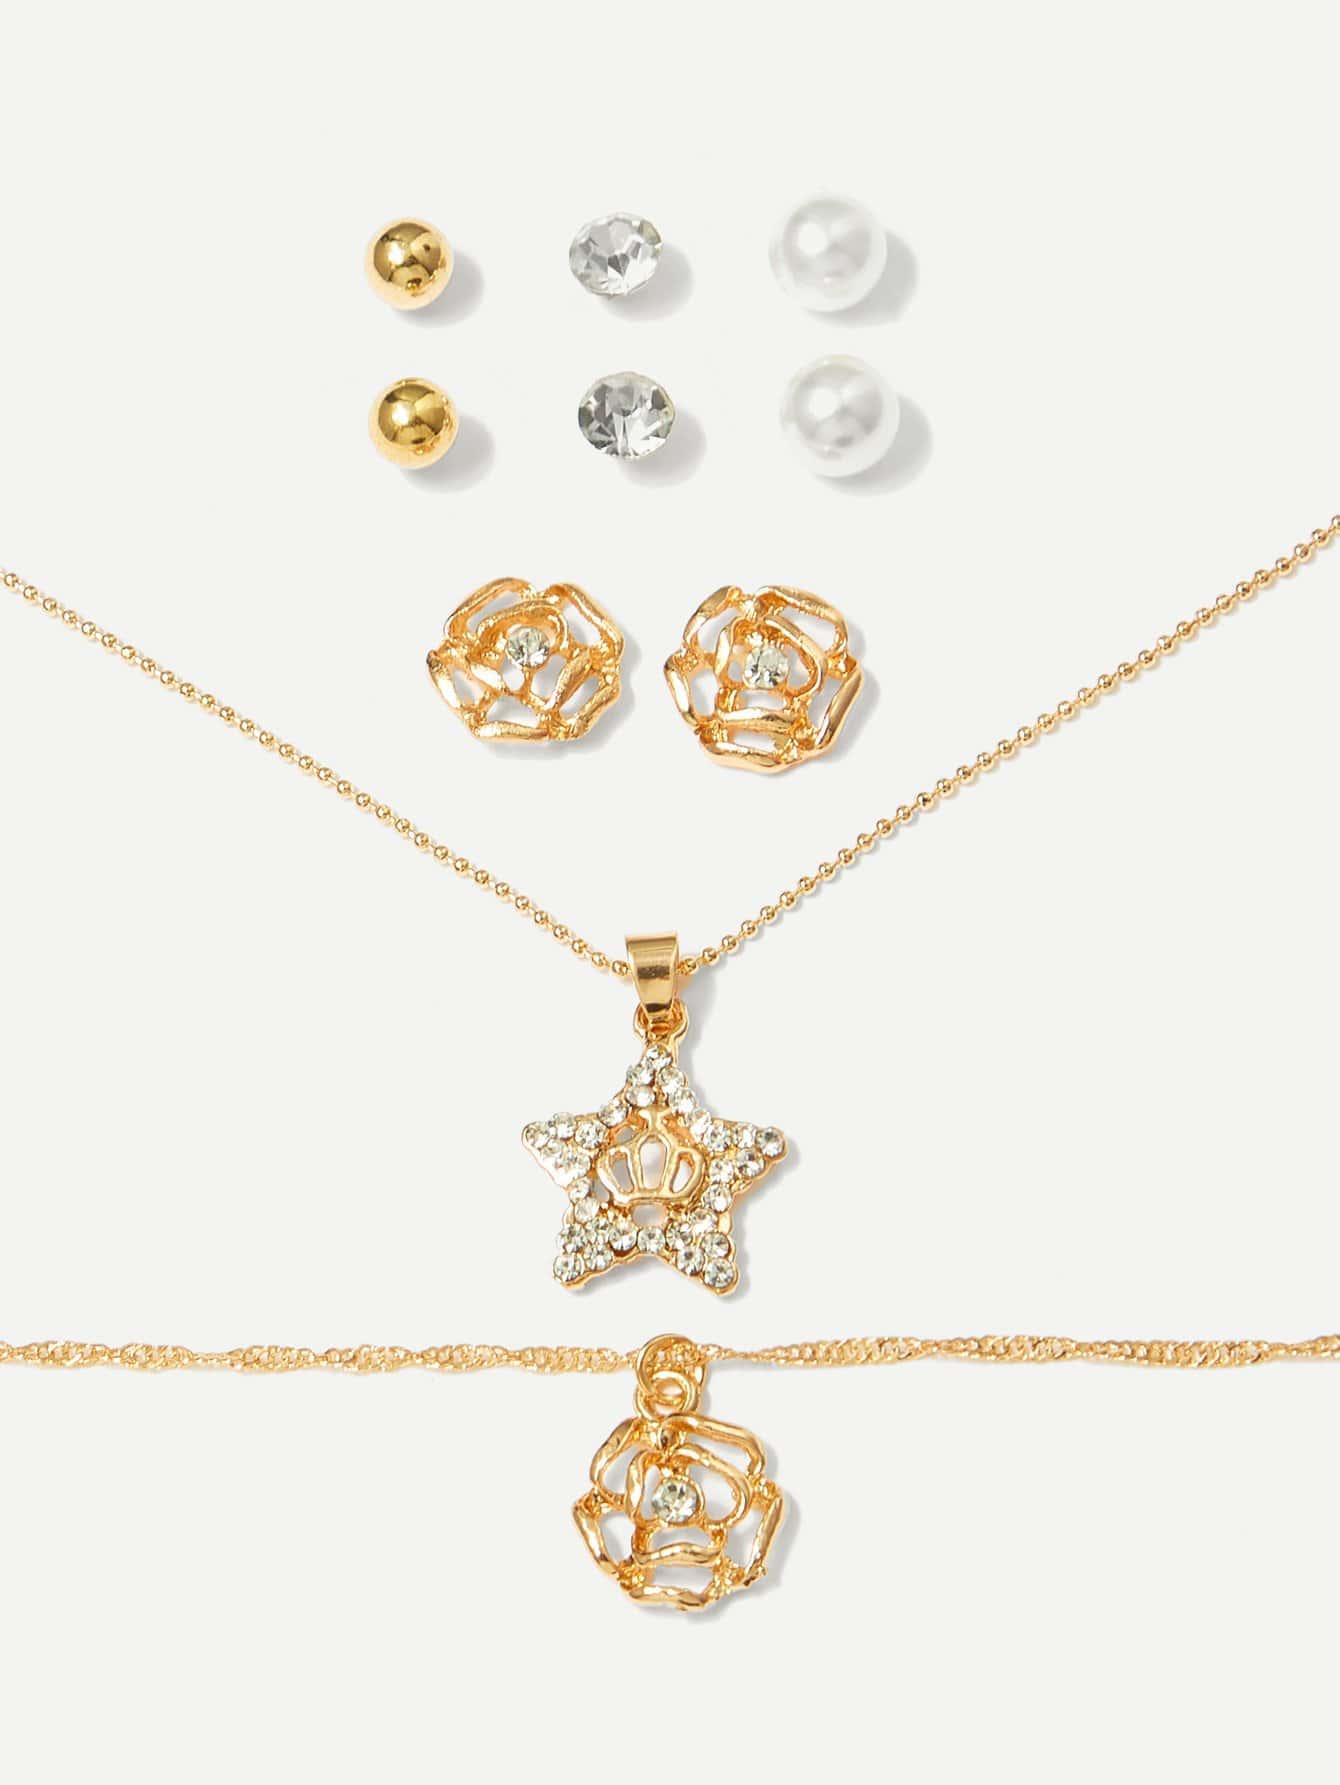 Halskette 1pc & Ohrringe 4pairs & Armband 1pc